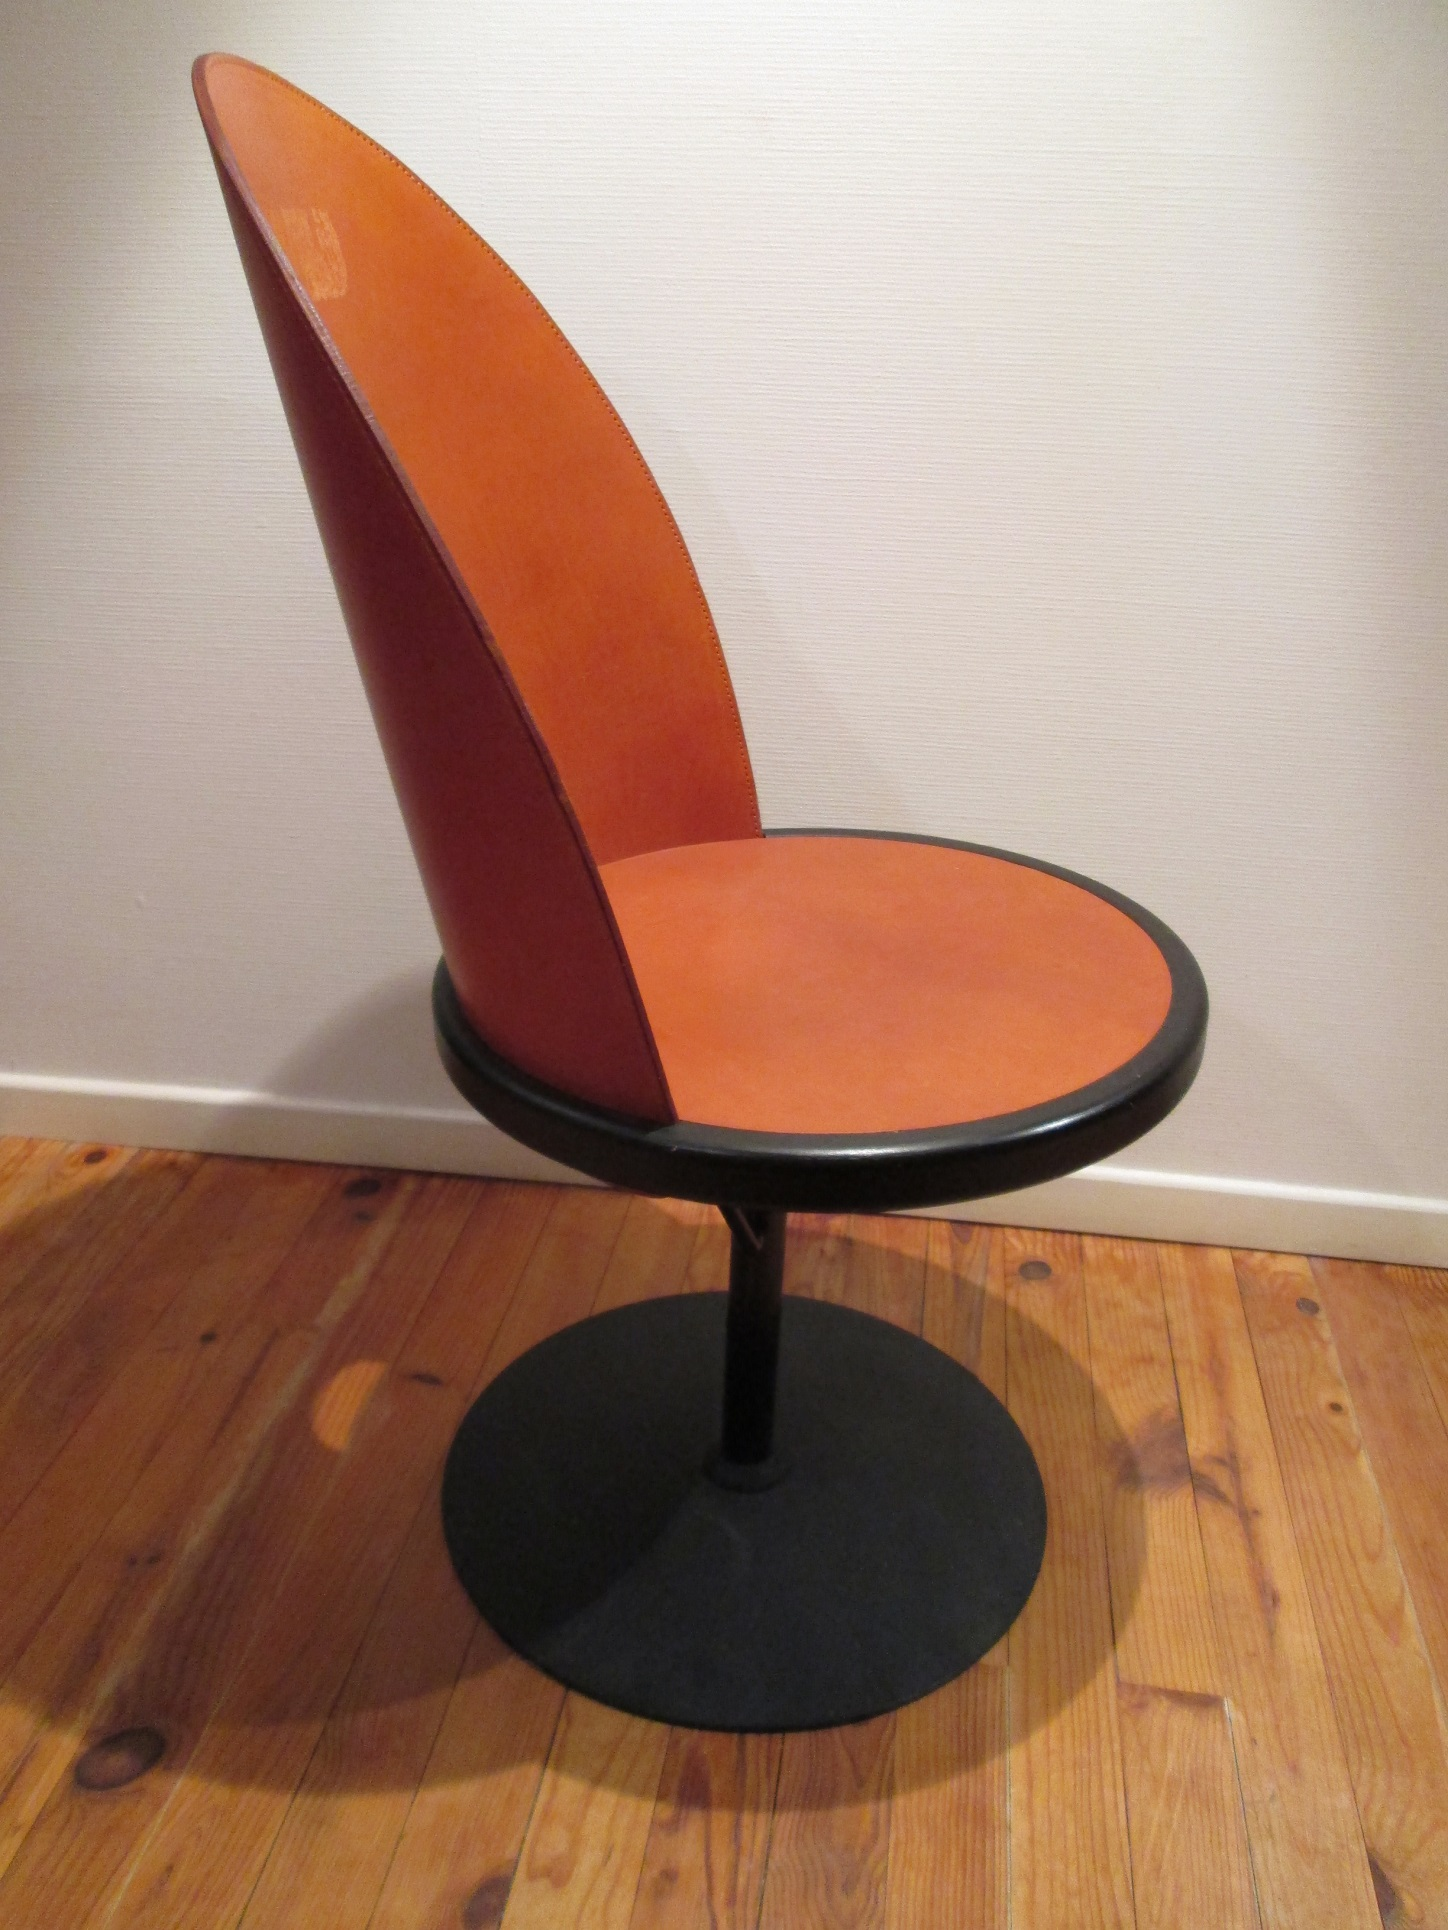 Oblado fauteuil alain benedick antiquit s alain benedick antiquit s - Fauteuil stockholm occasion ...